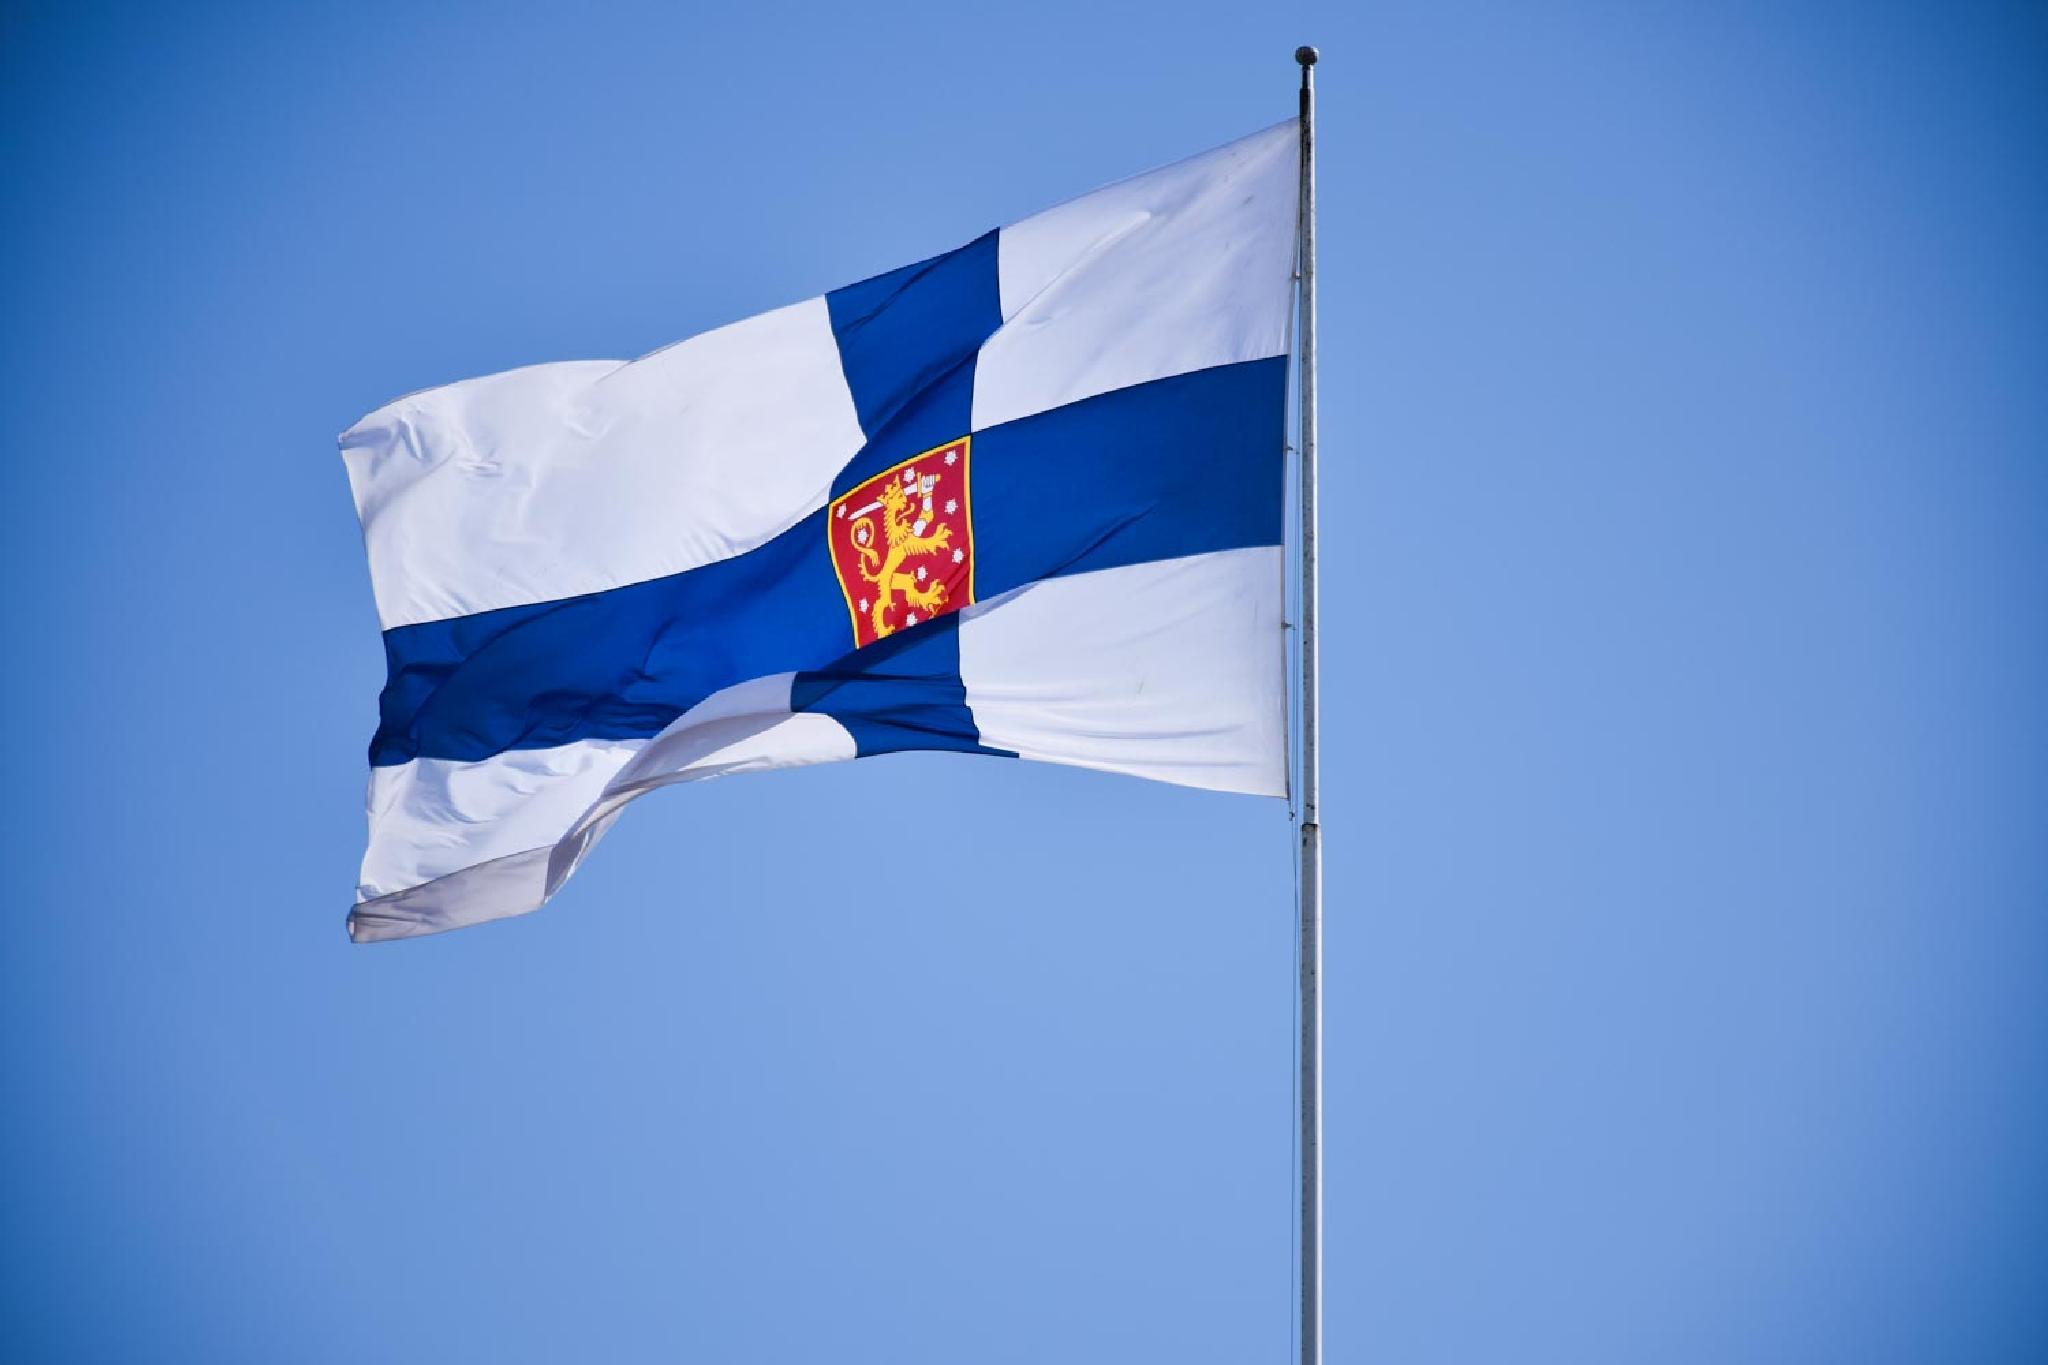 A A Flag I See Somewhere around Senator Square Helsinki Finland by aronrielle